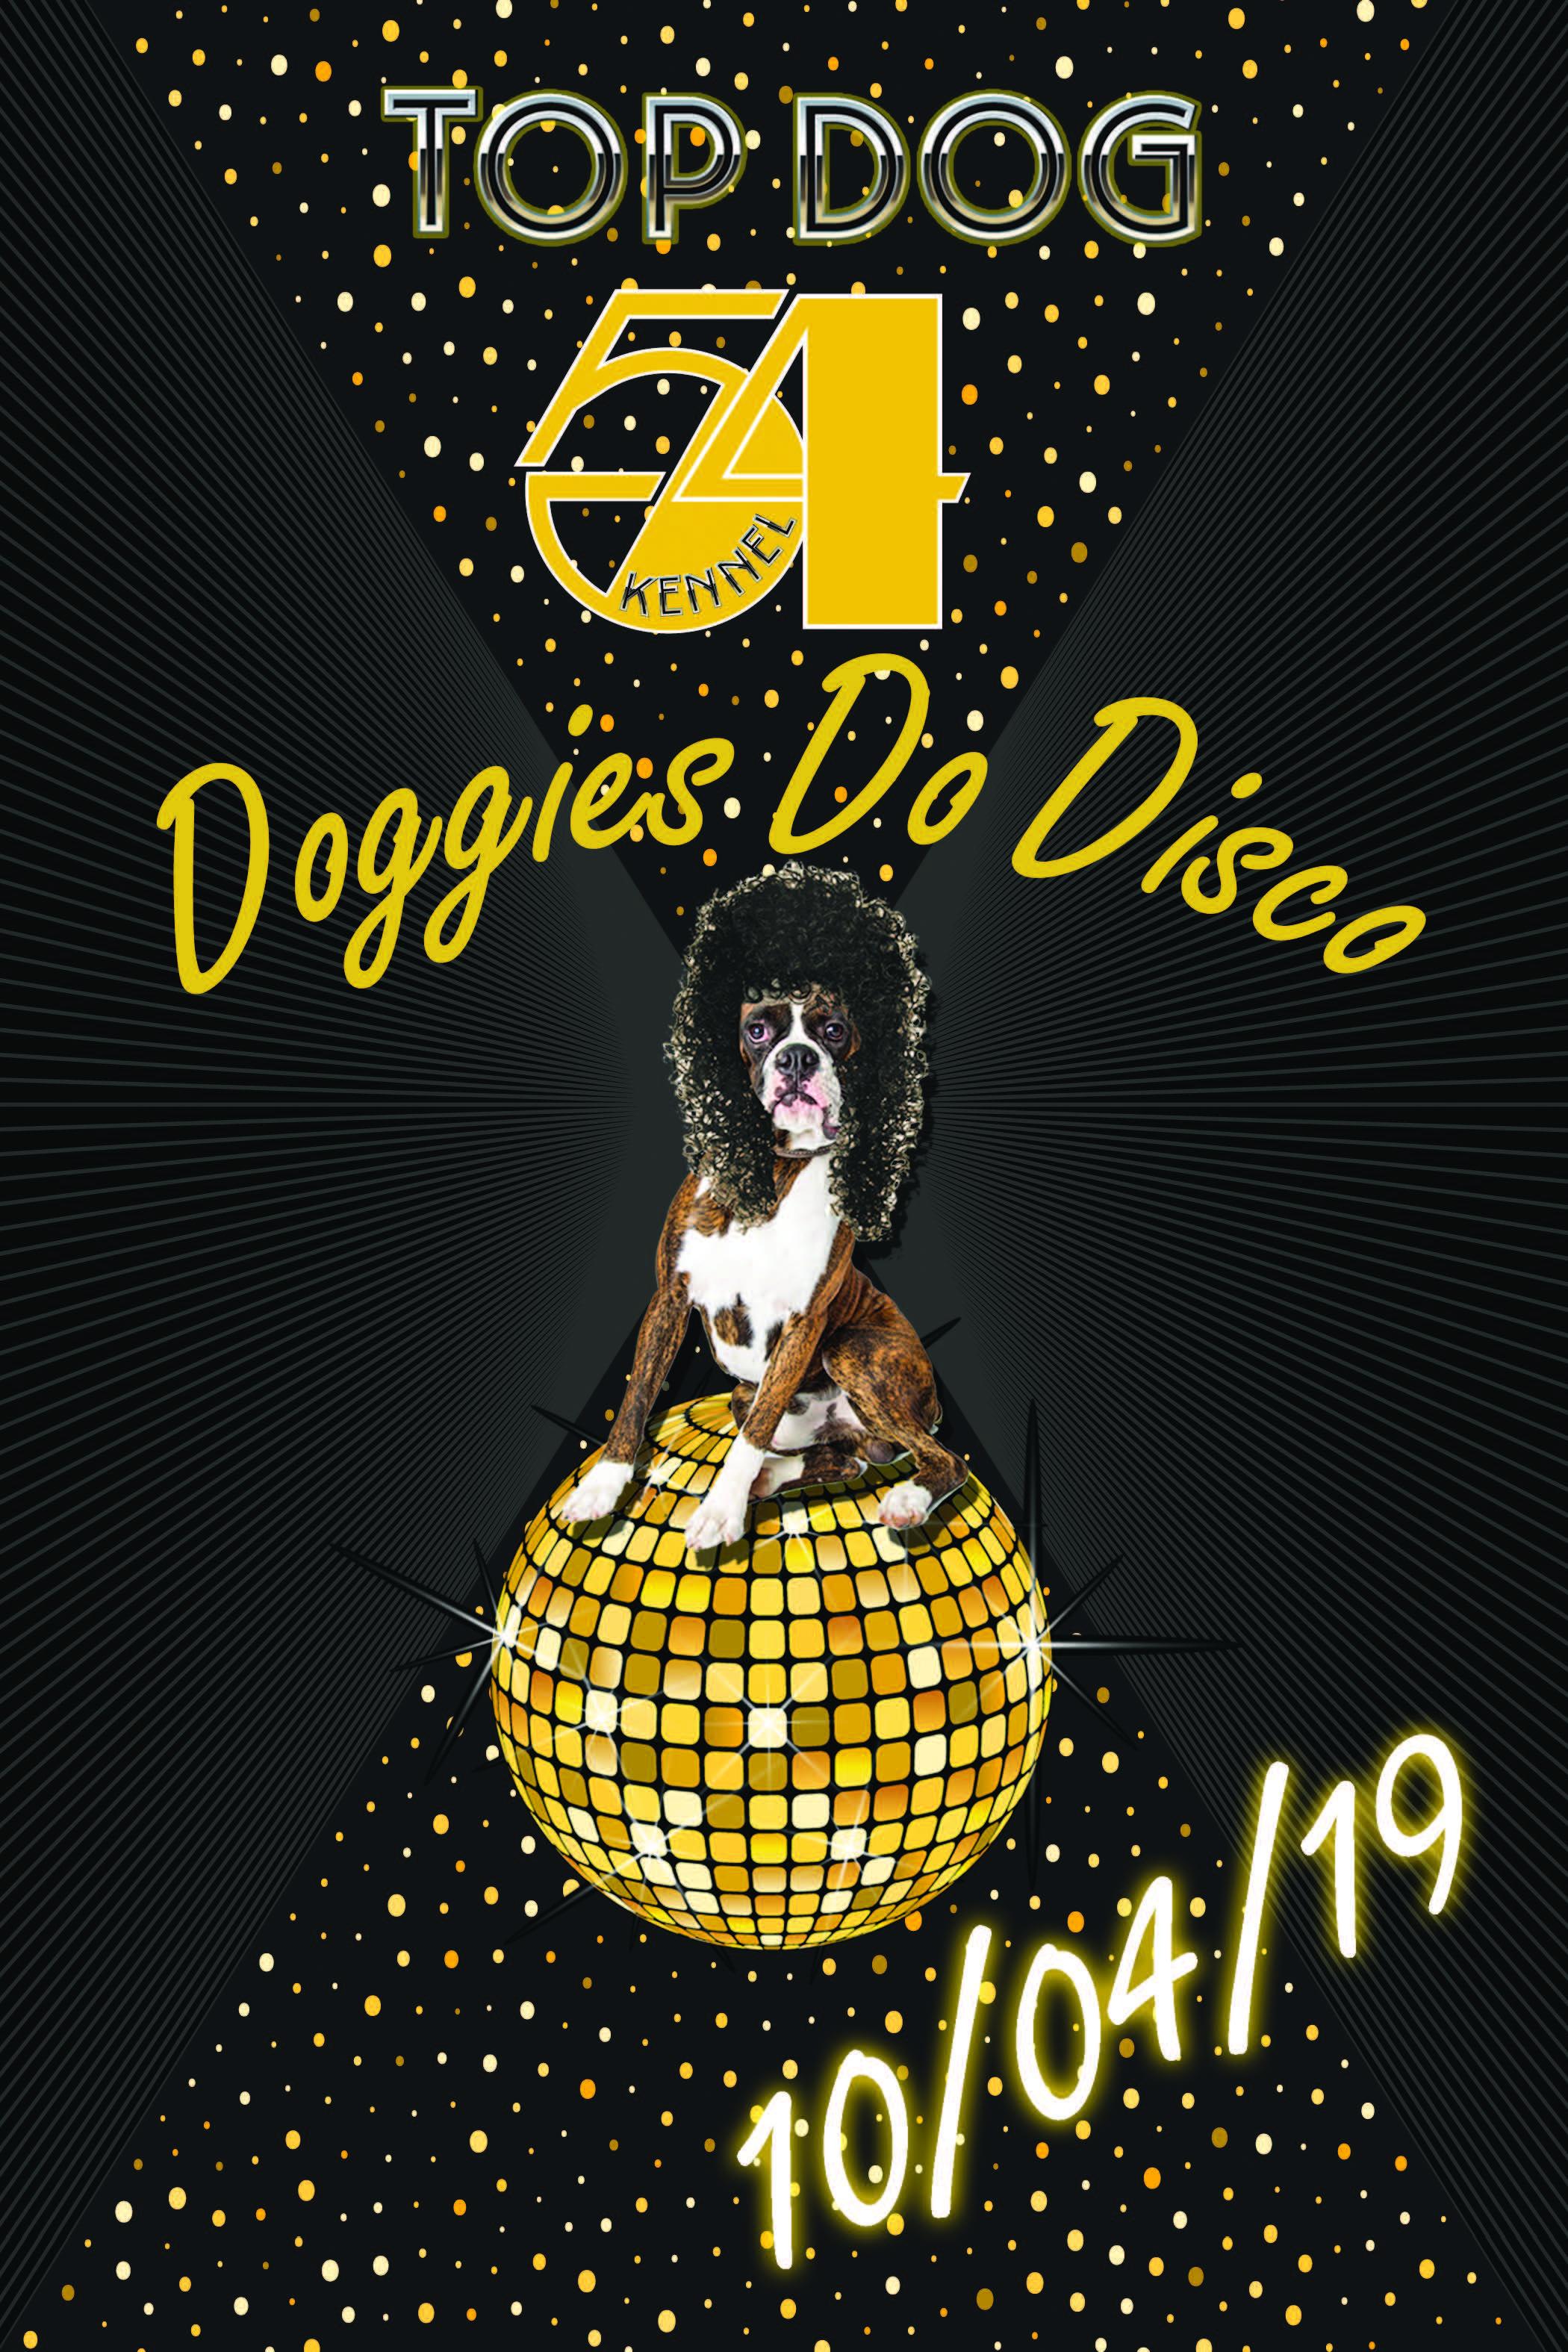 Td dog on disco ball b